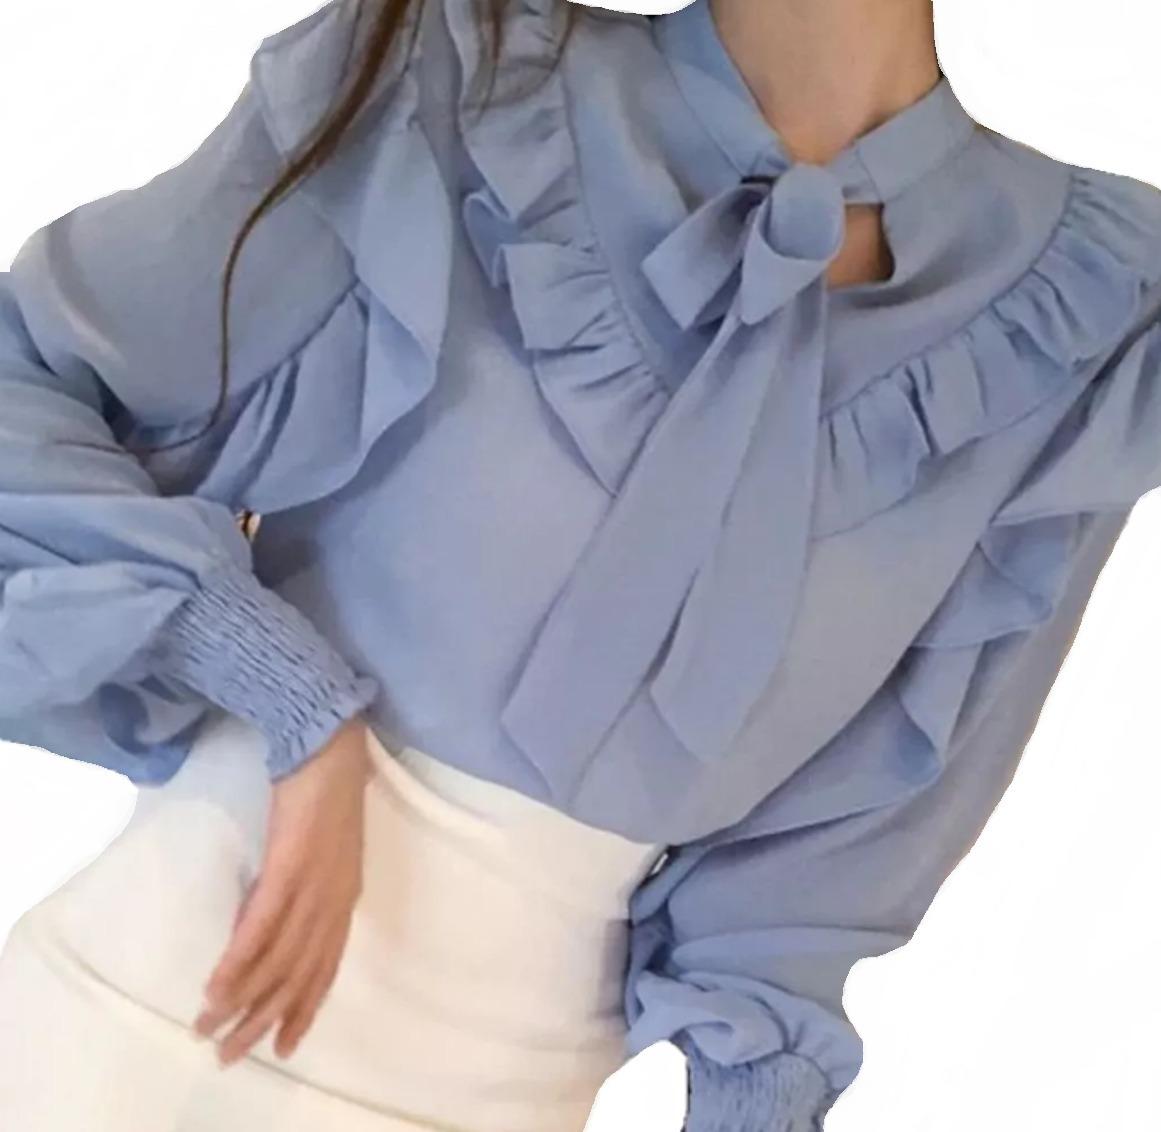 ccfea6d22b blusa feminino manga longa social detalhes de luxo foto real. Carregando  zoom.